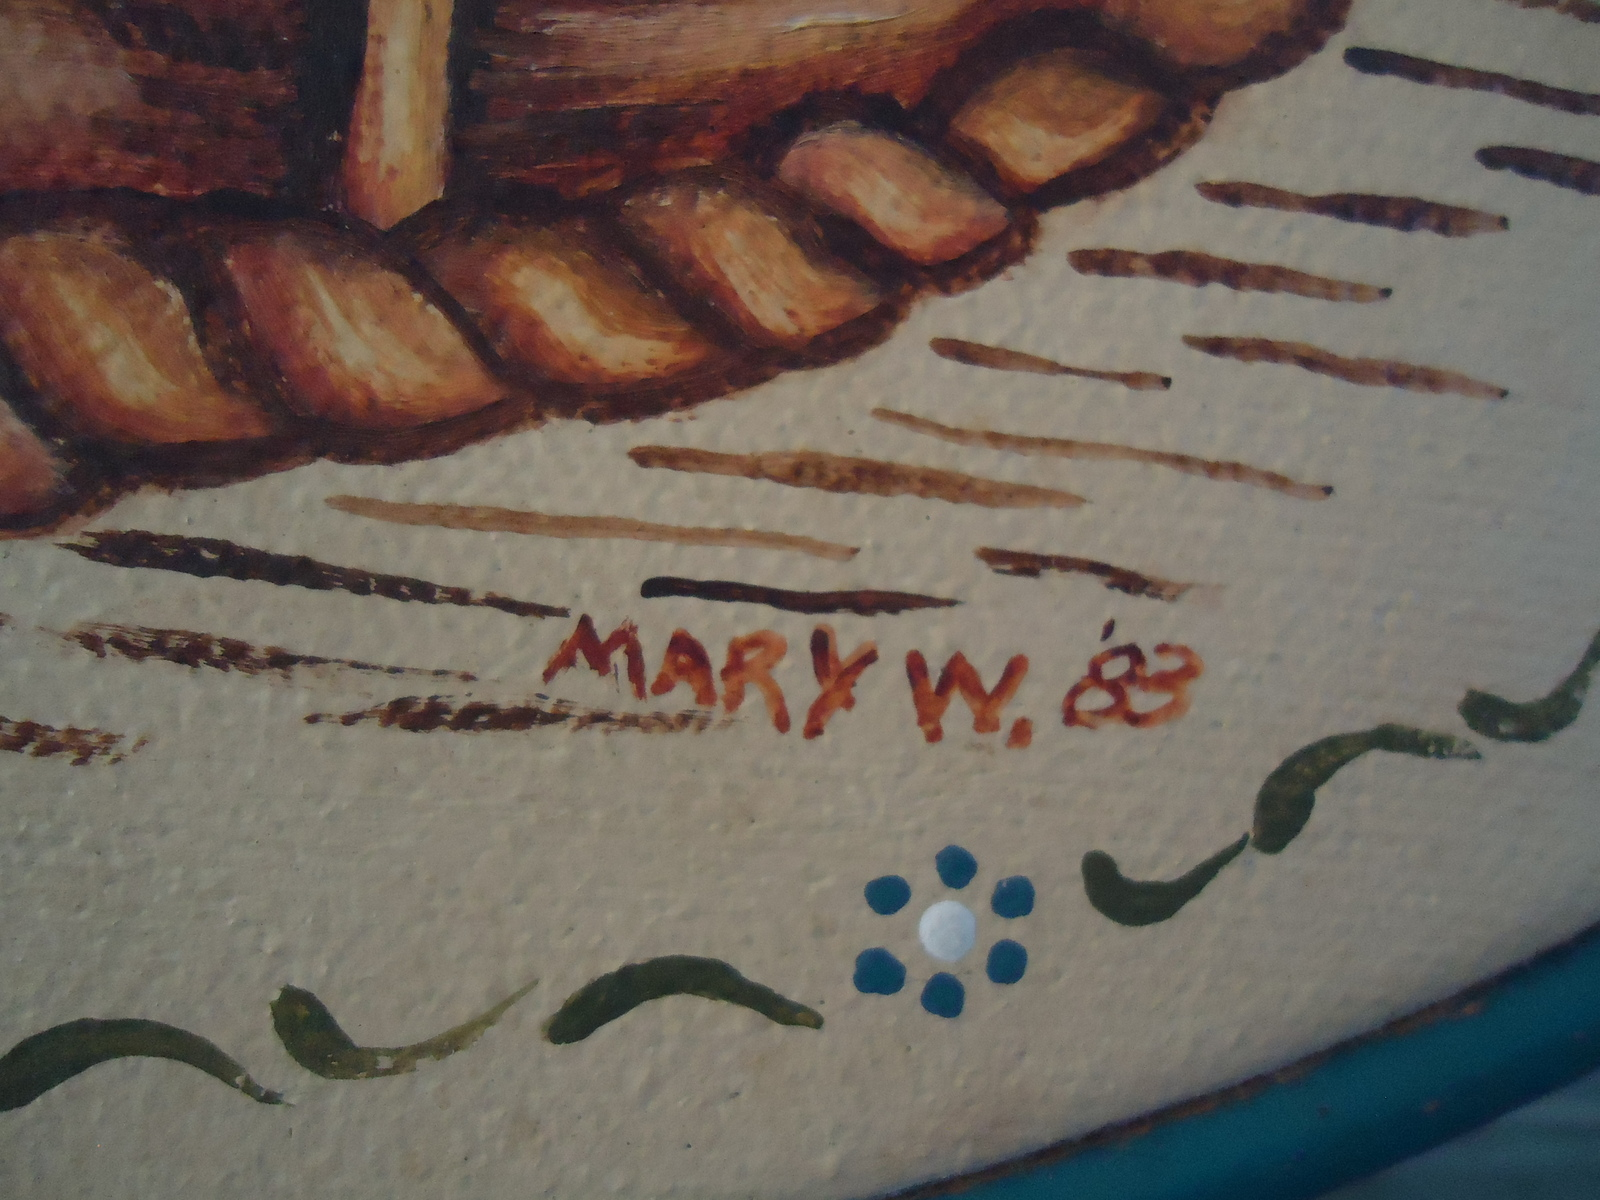 Folk Art Goose Painting Primitive Original by Mary Weiberg 1988